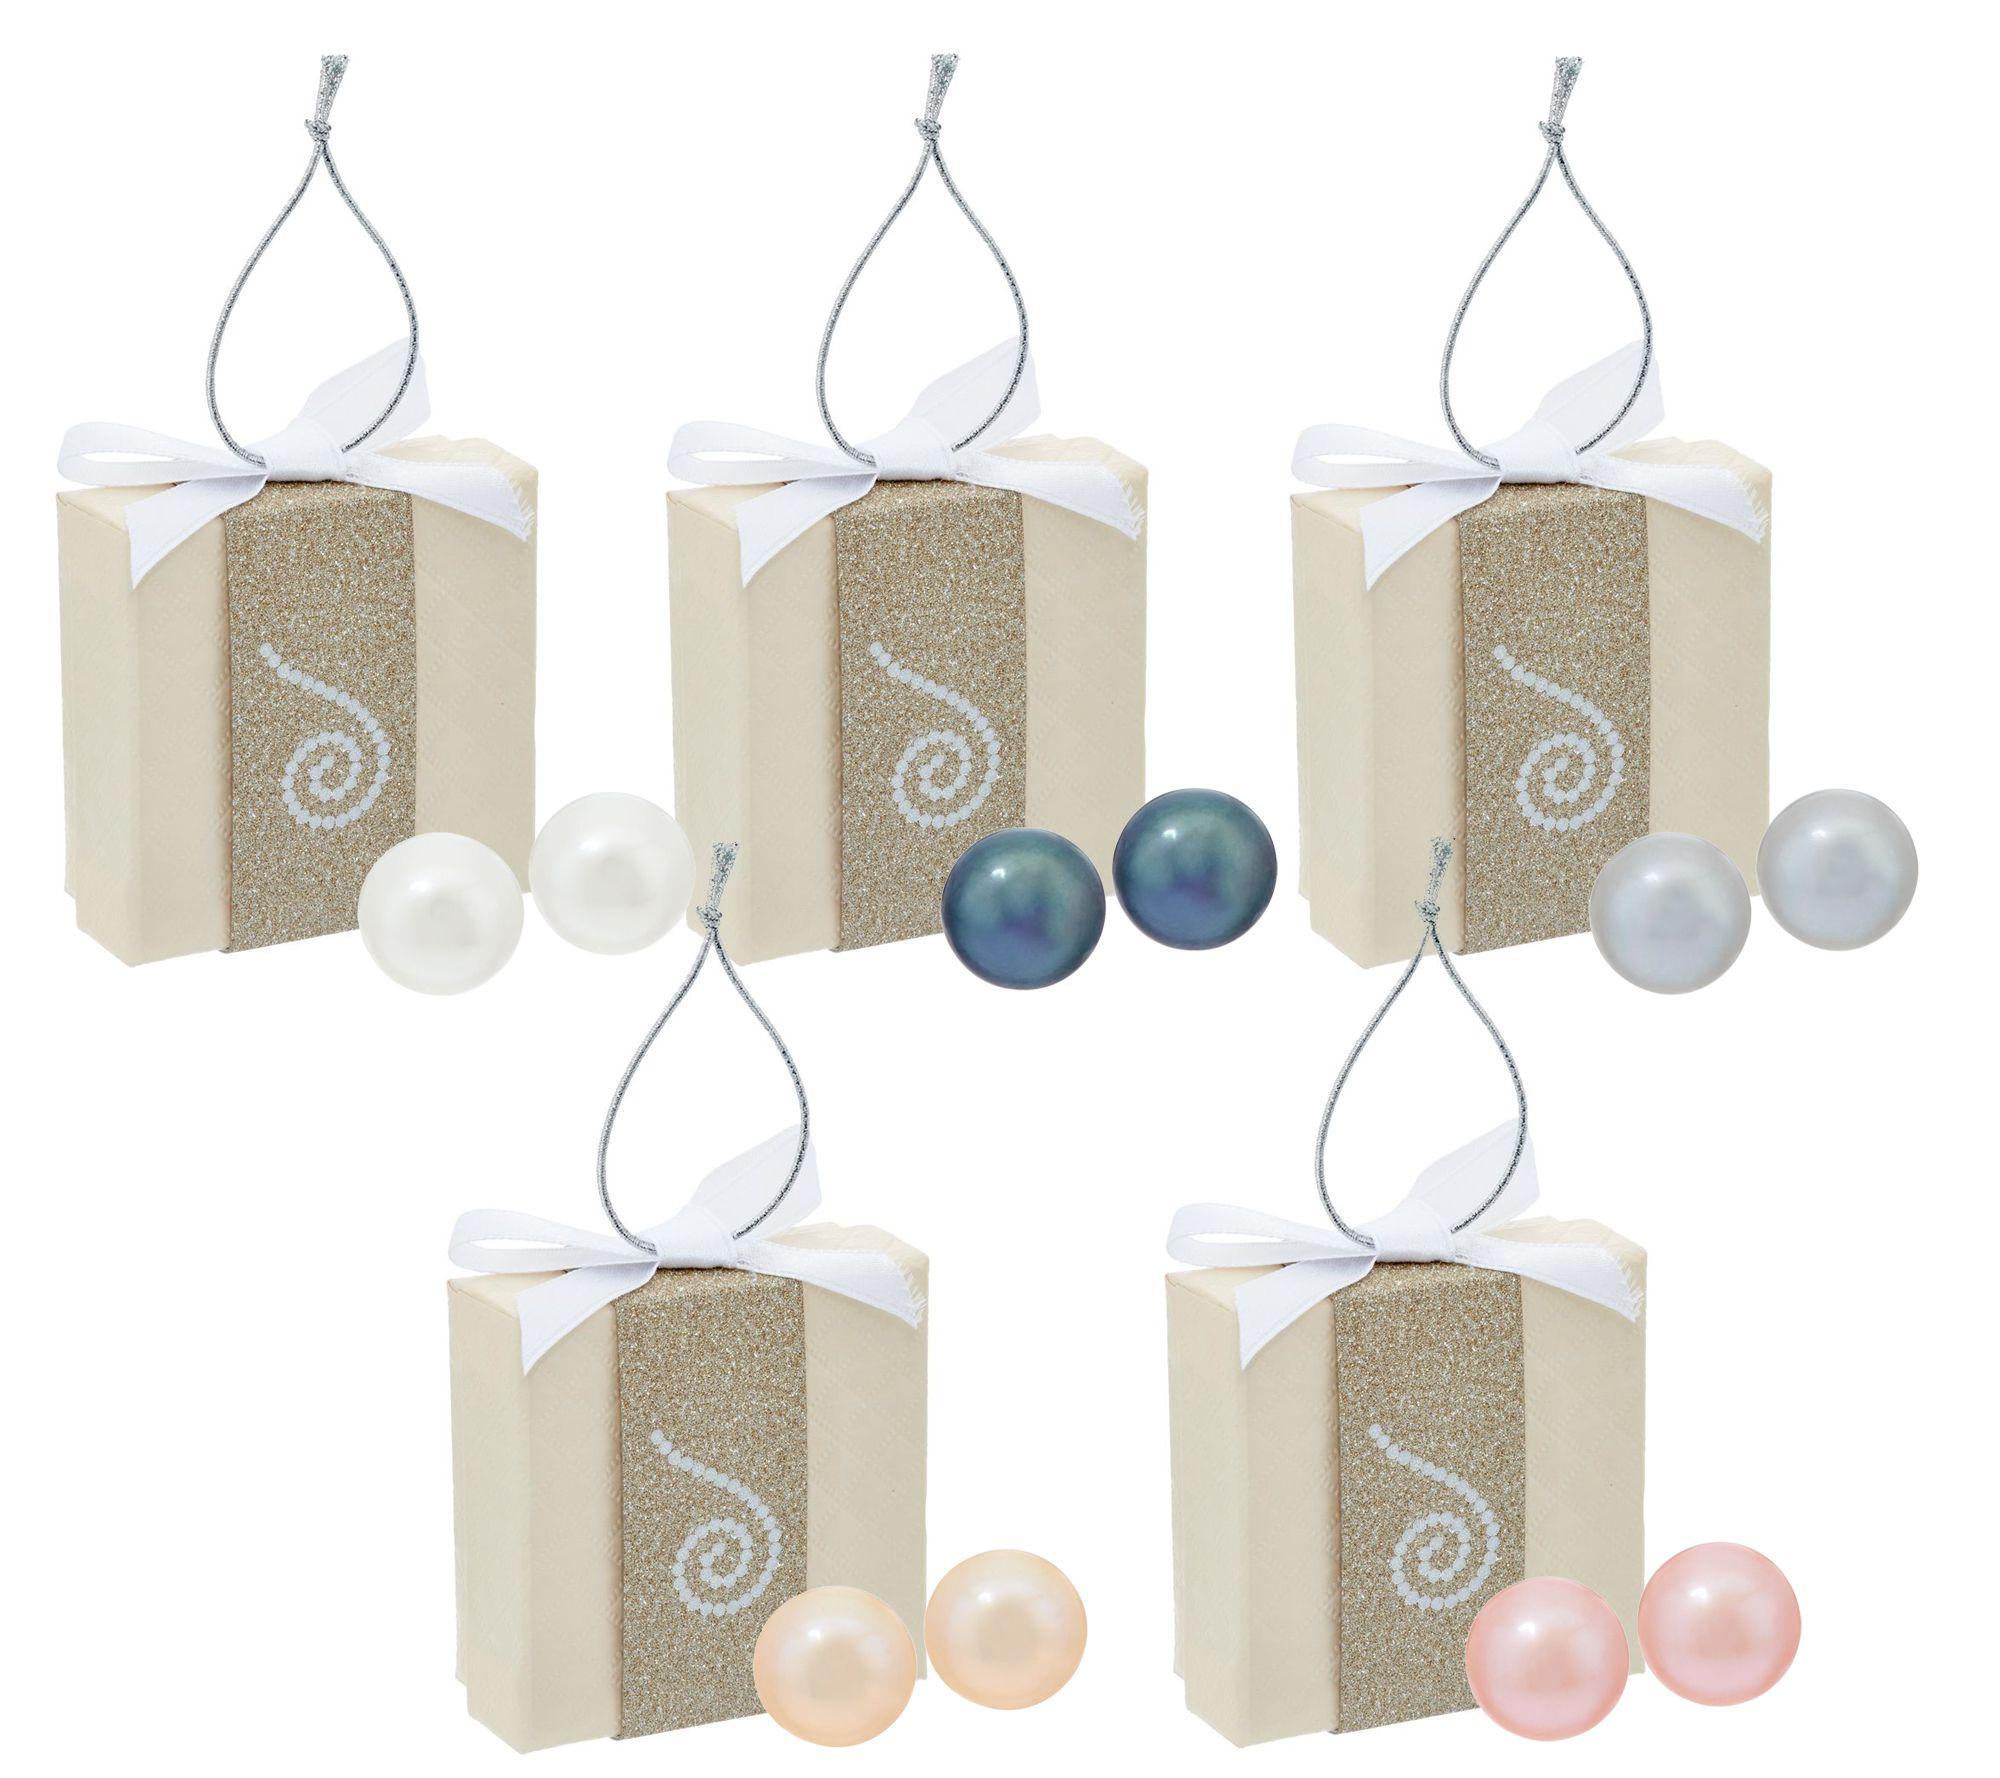 Honora Cultured Pearl Set Of 5 80mm Boxed Stainless Steel Stud Earrings   J329794